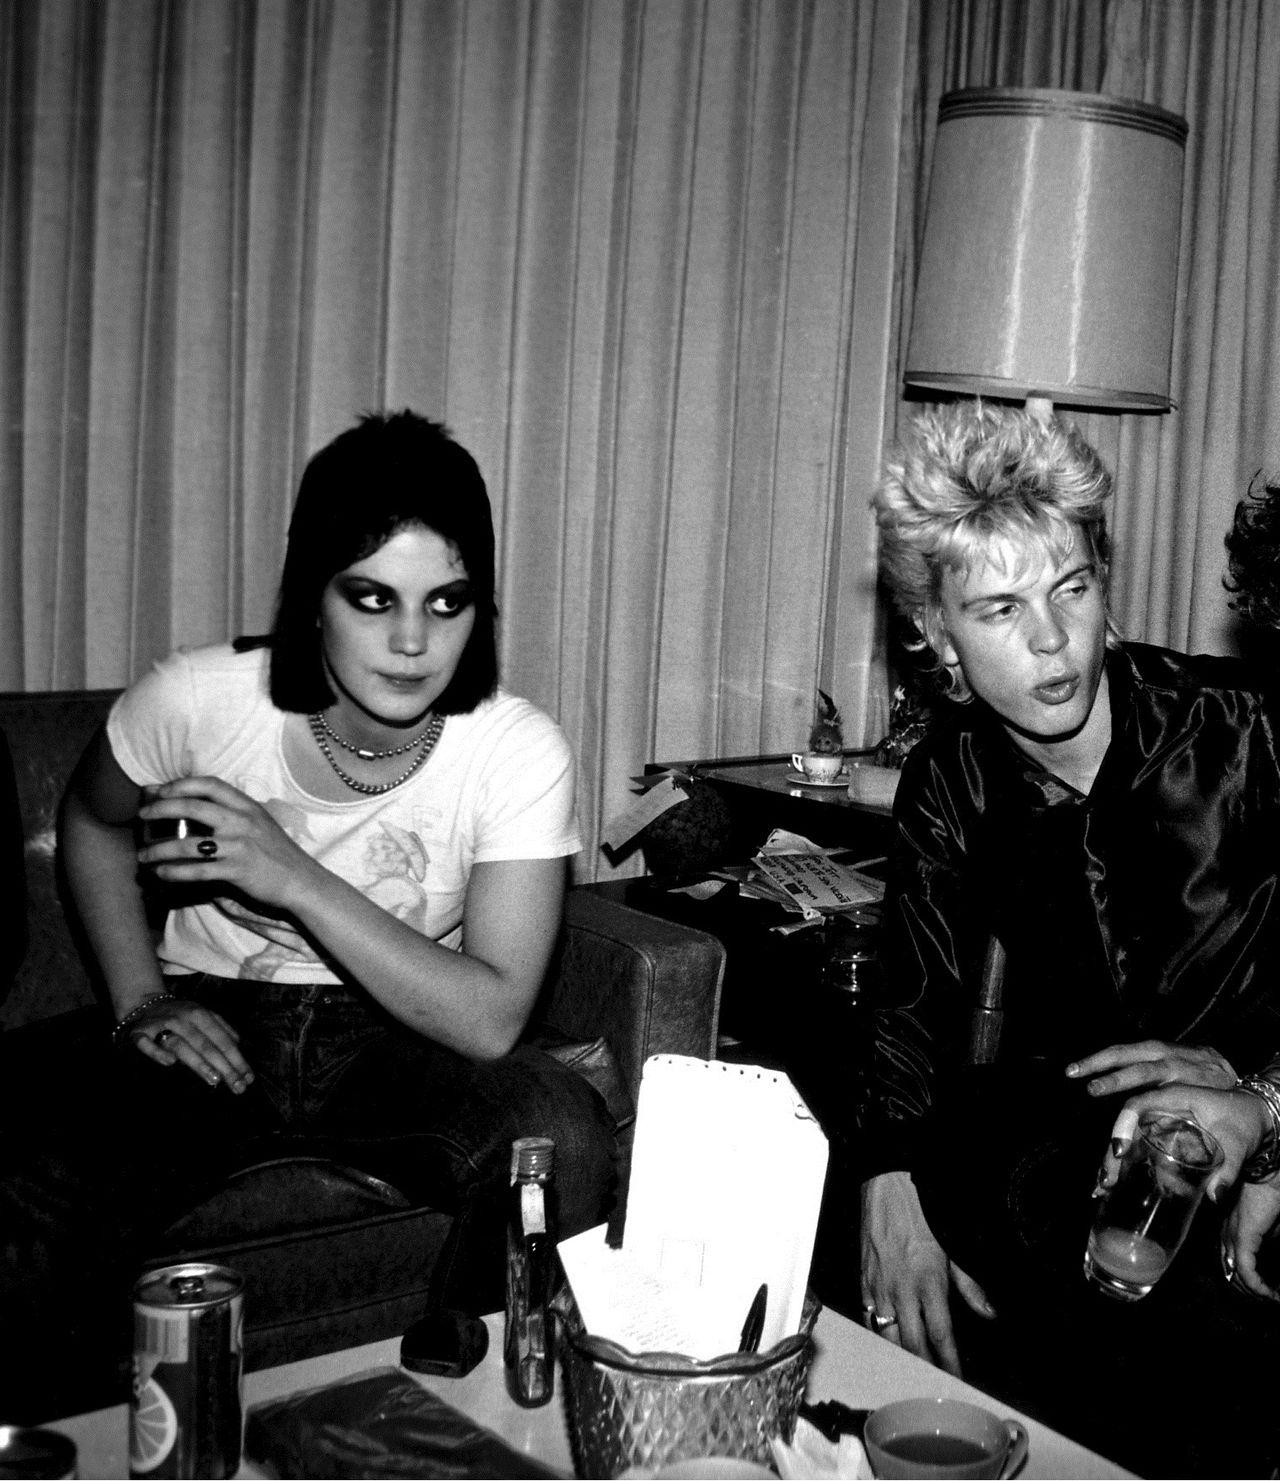 Joan Jett & Billy Idol photographed by Theresa Kereakes.